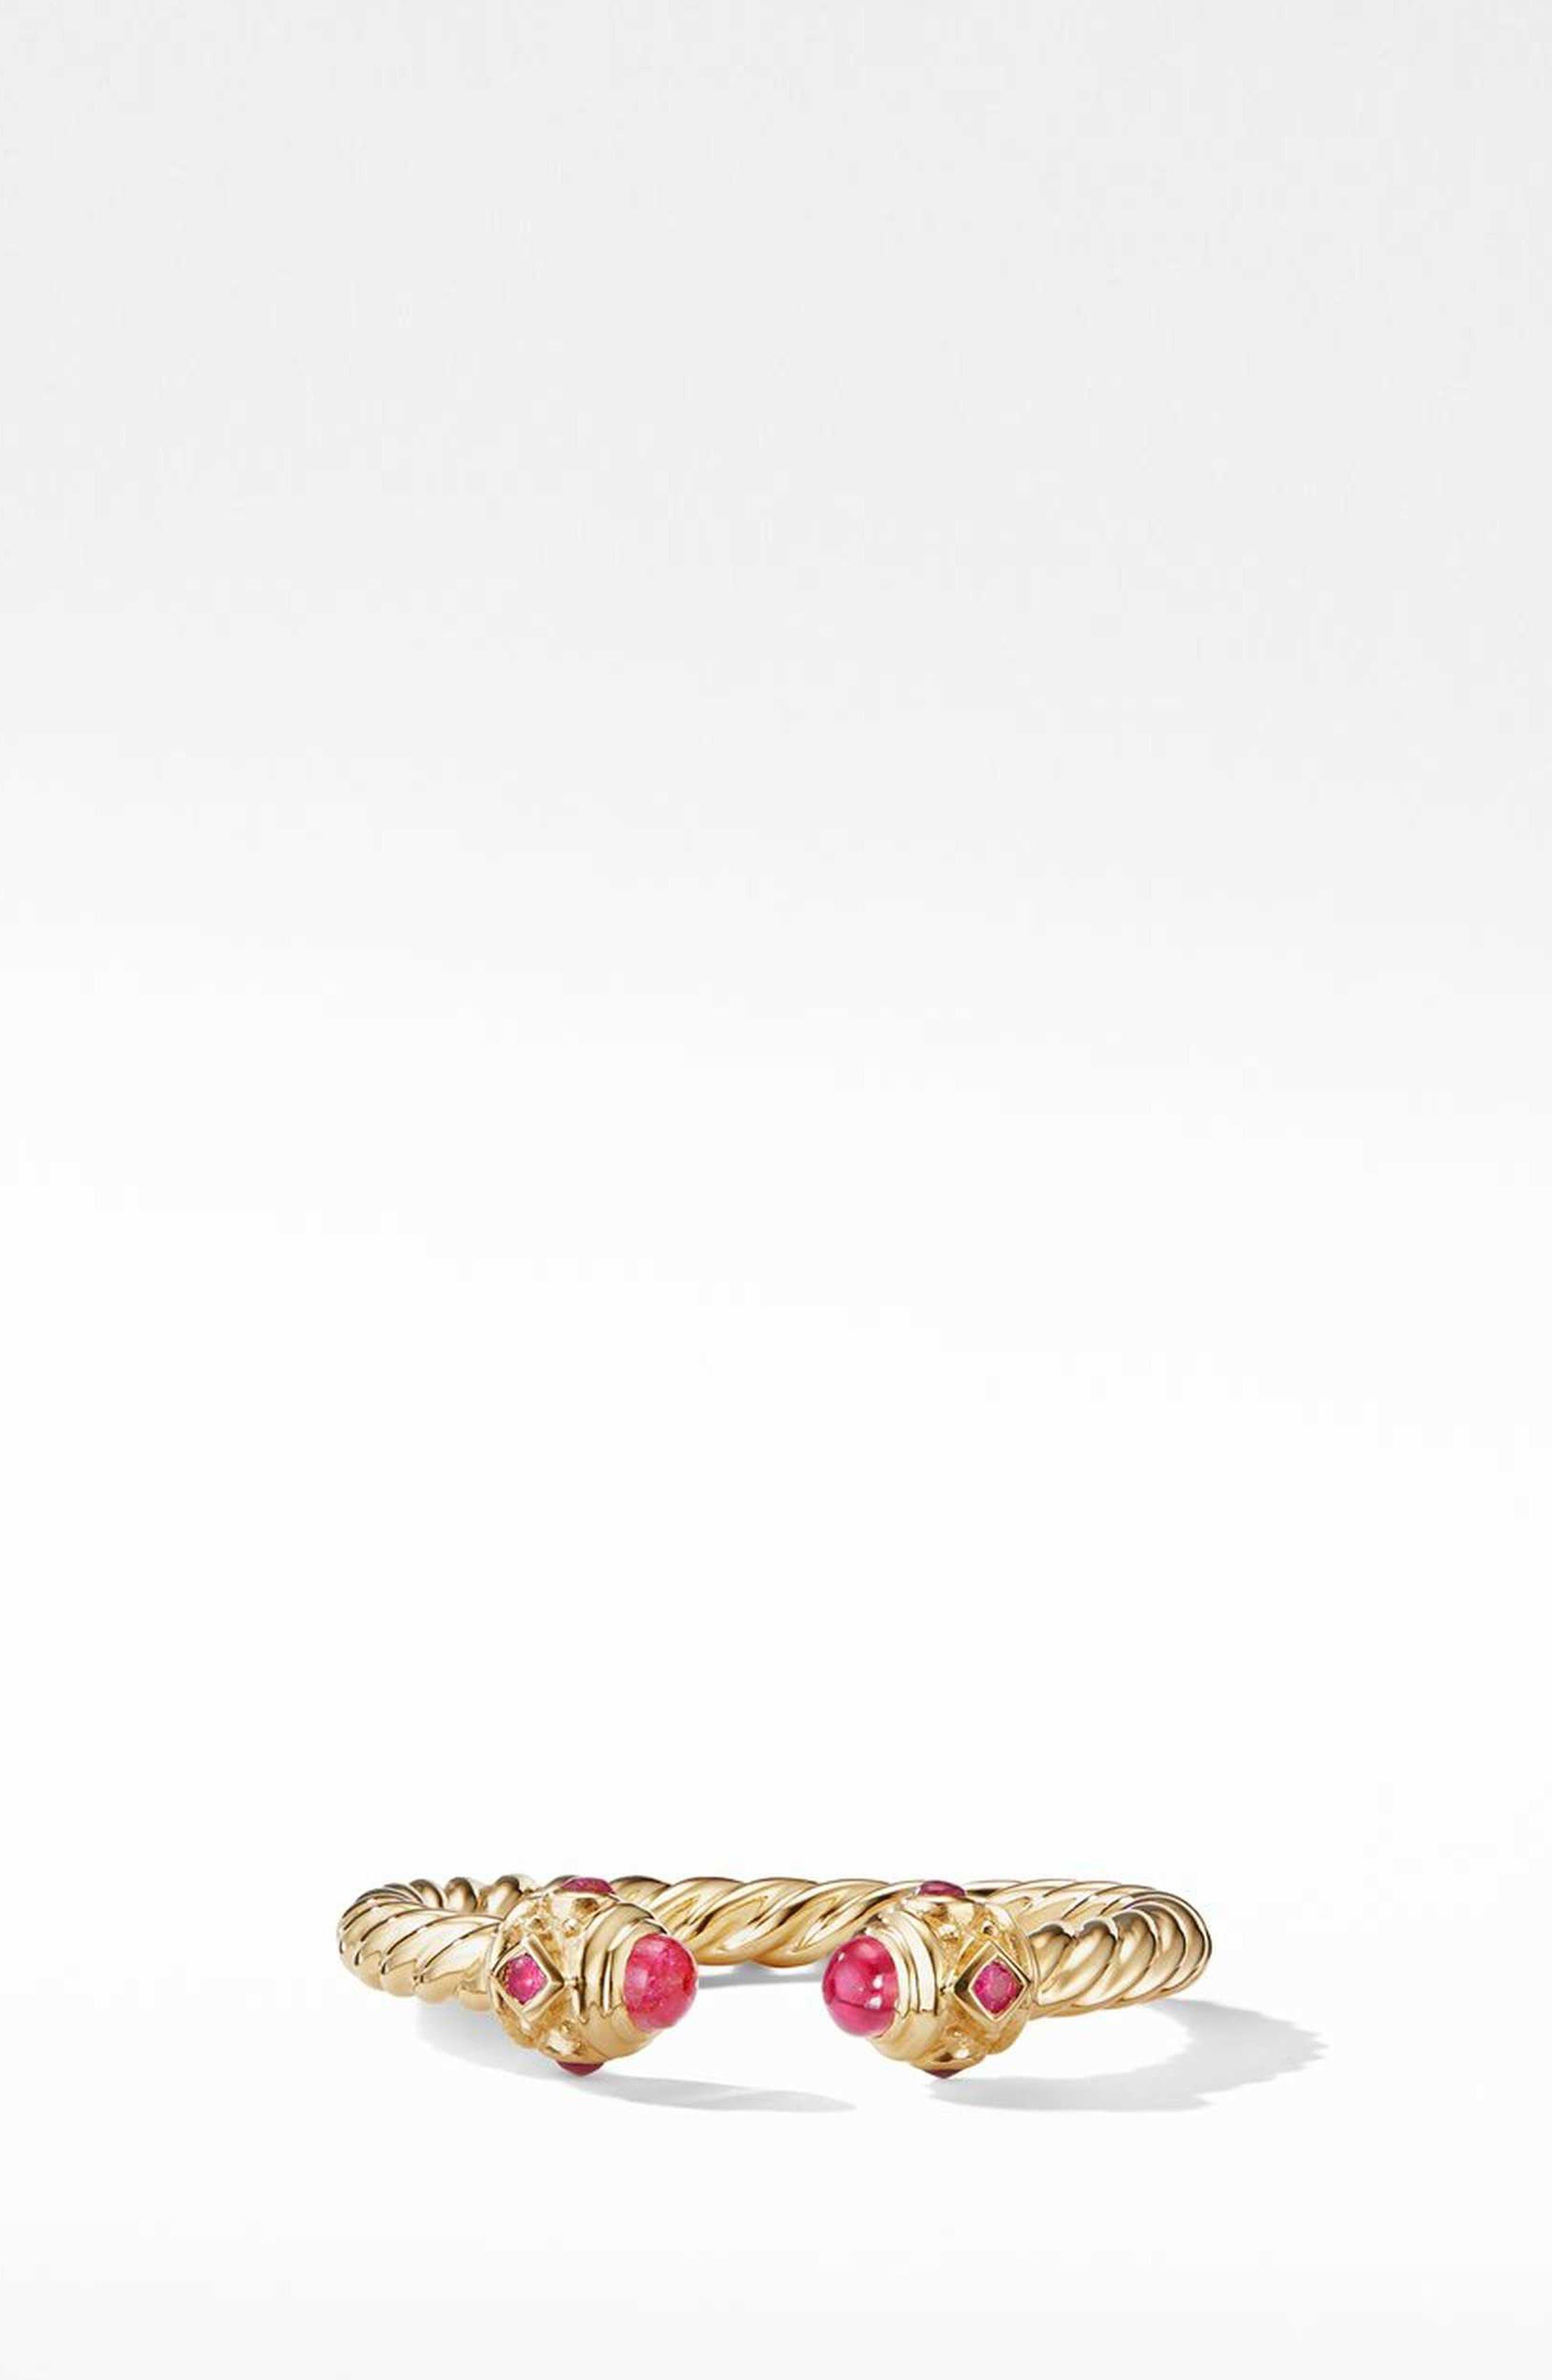 Renaissance Full Pavé Ring in 18K Gold,                             Main thumbnail 1, color,                             RUBY